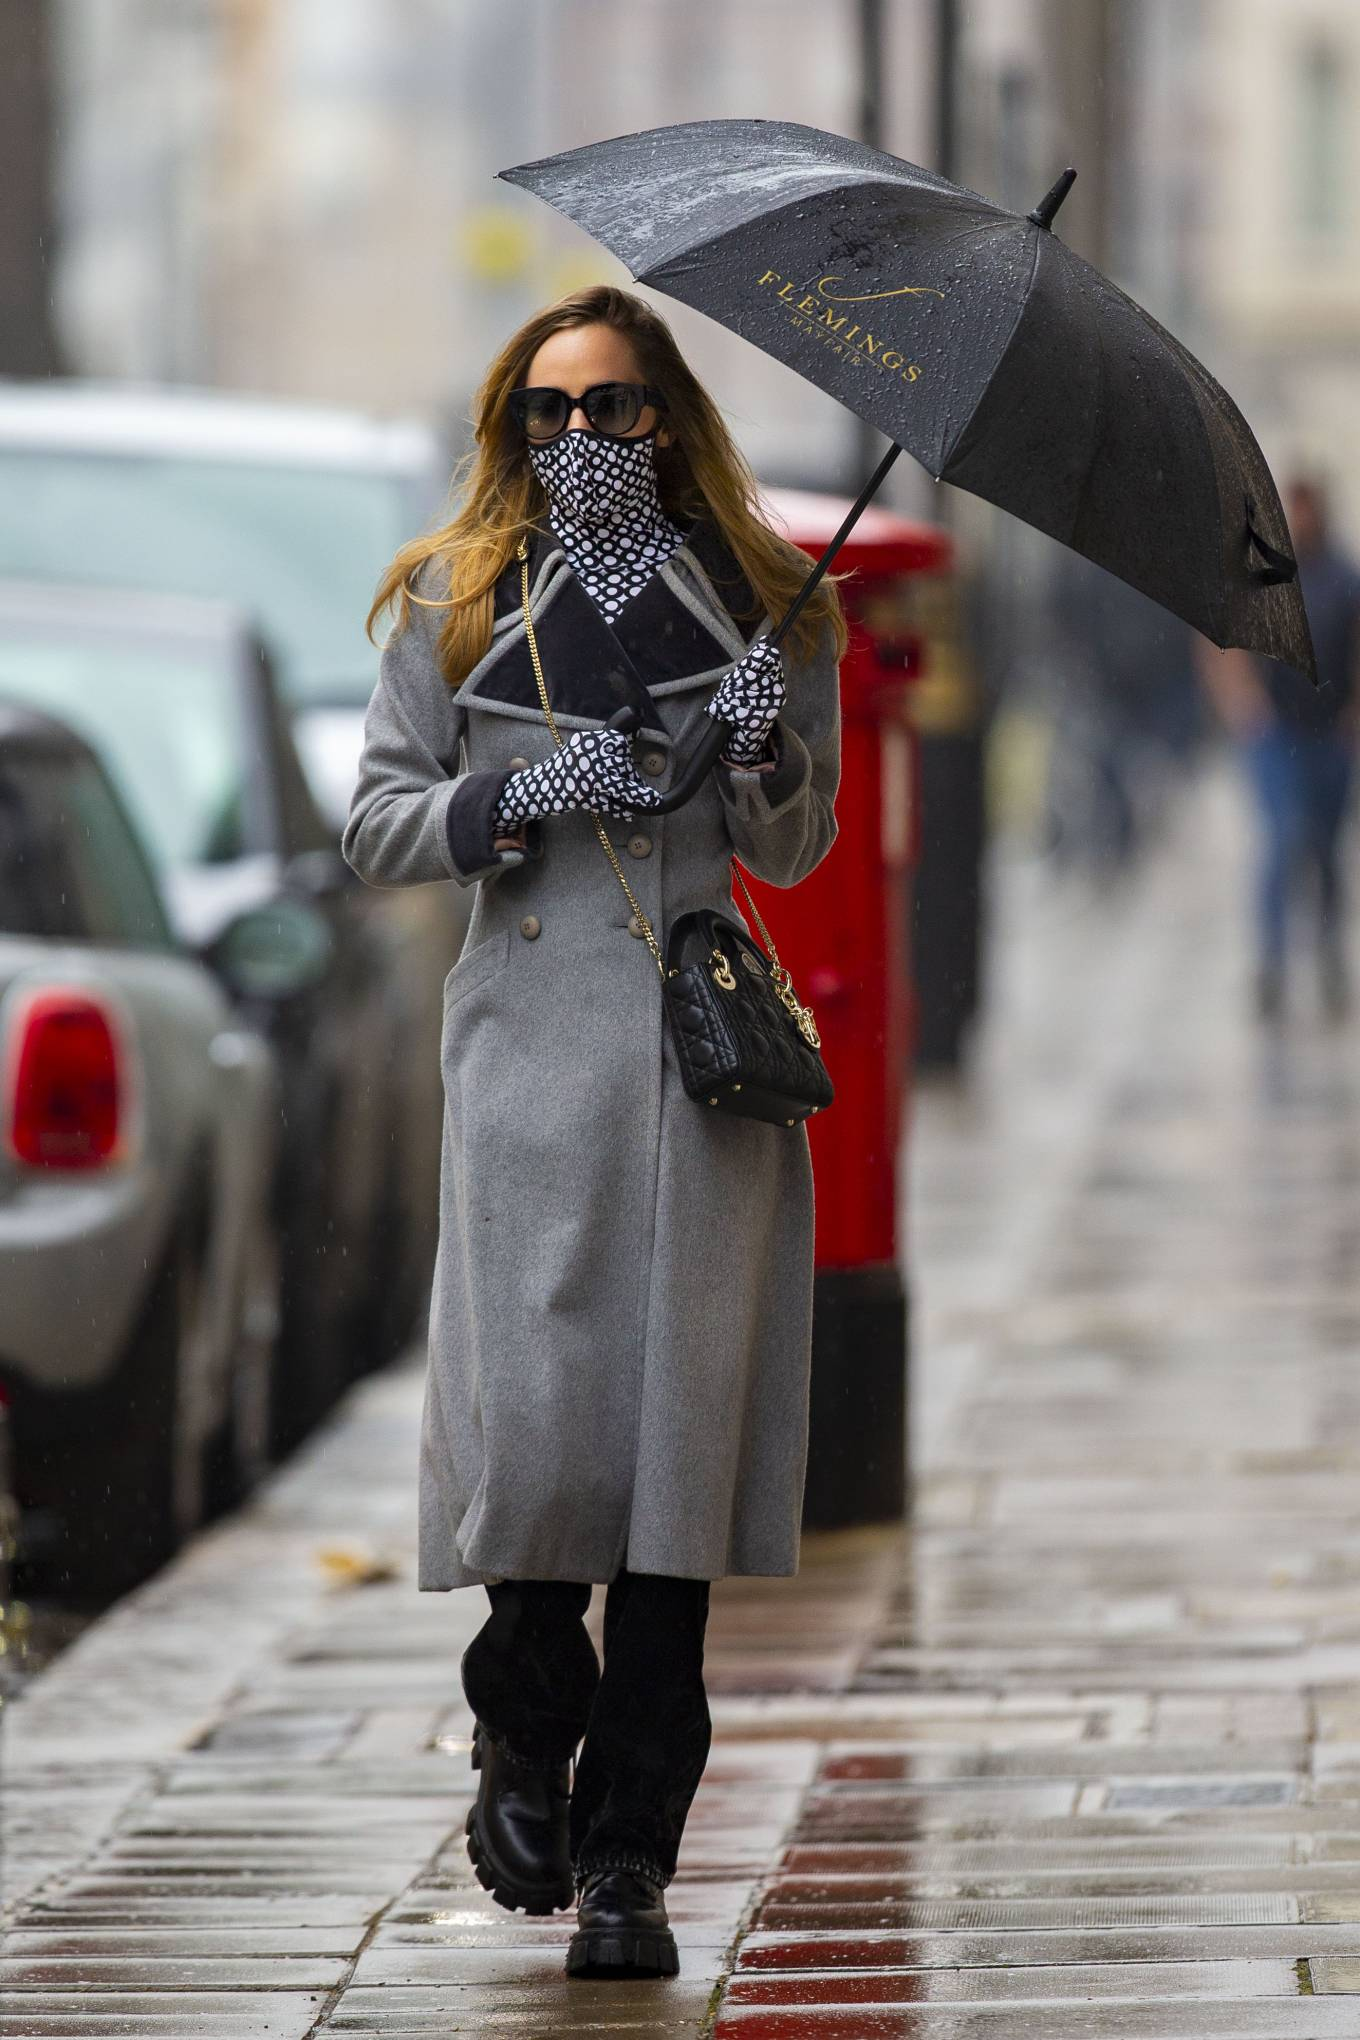 Suki Waterhouse - In grey coat on rainy day in London